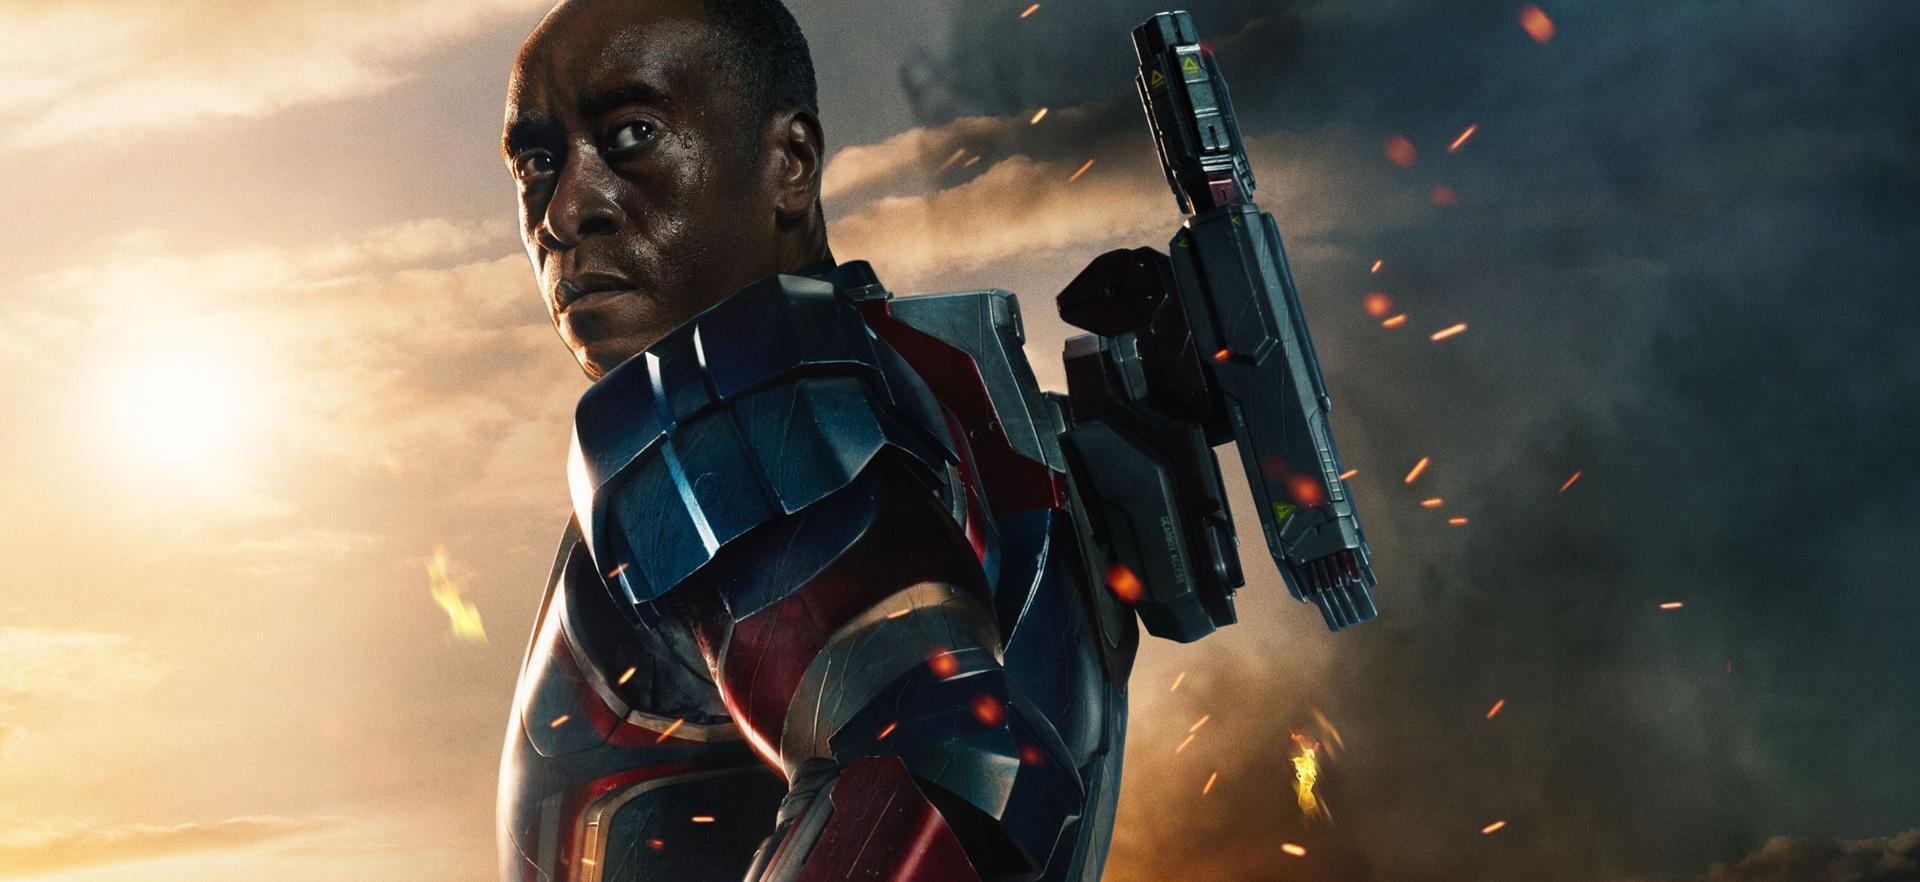 iron-man-3-james-rhodes-as-iron-patriot-hd-wallpaper - black girl nerds